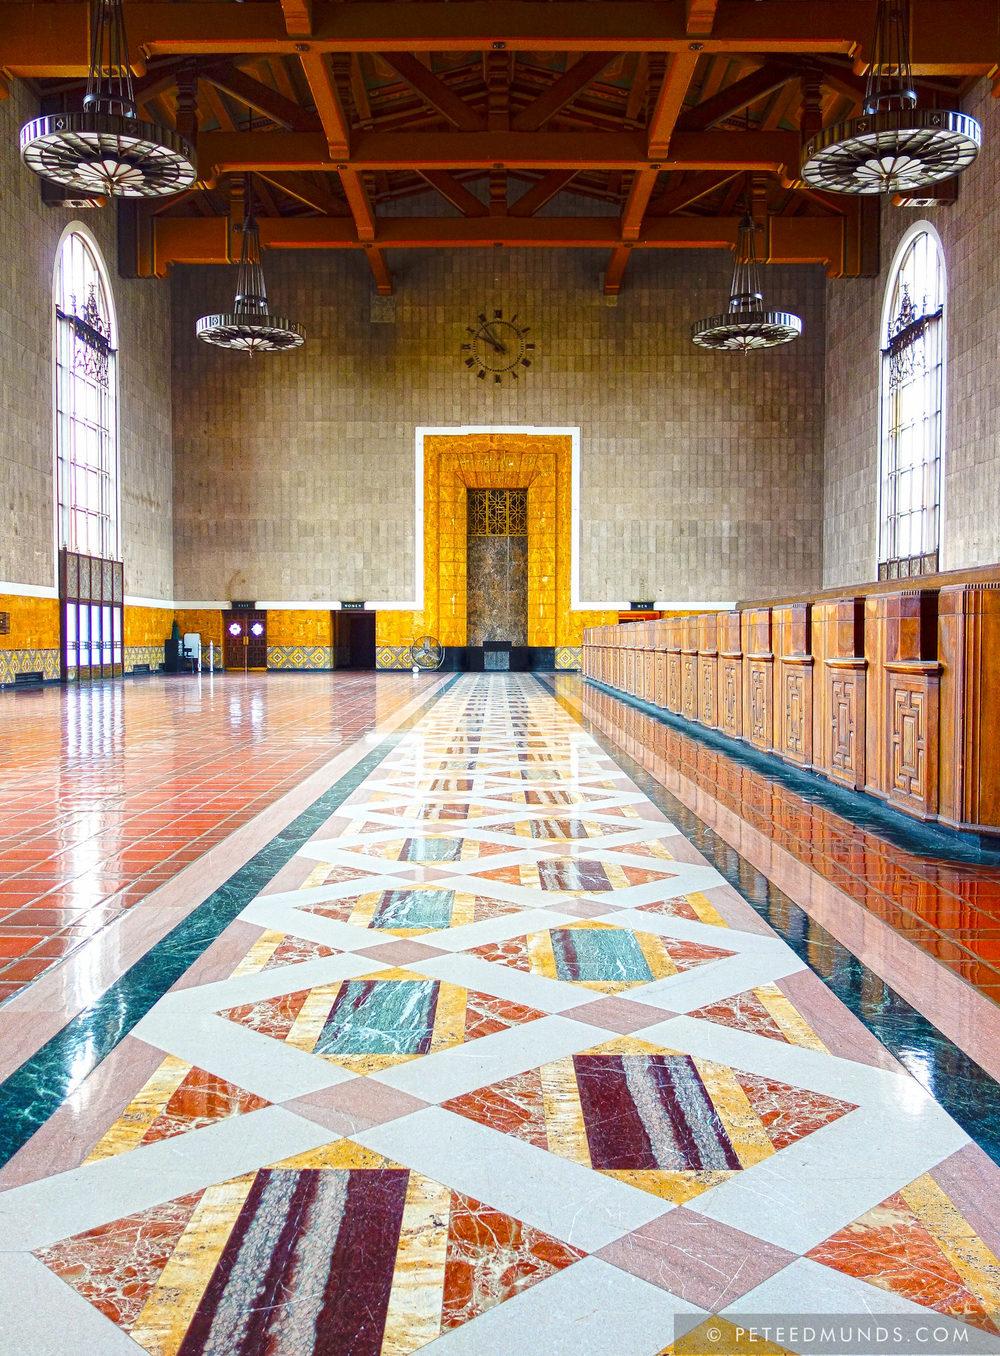 Old Ticketing Hall - Union Station - LA   HDR